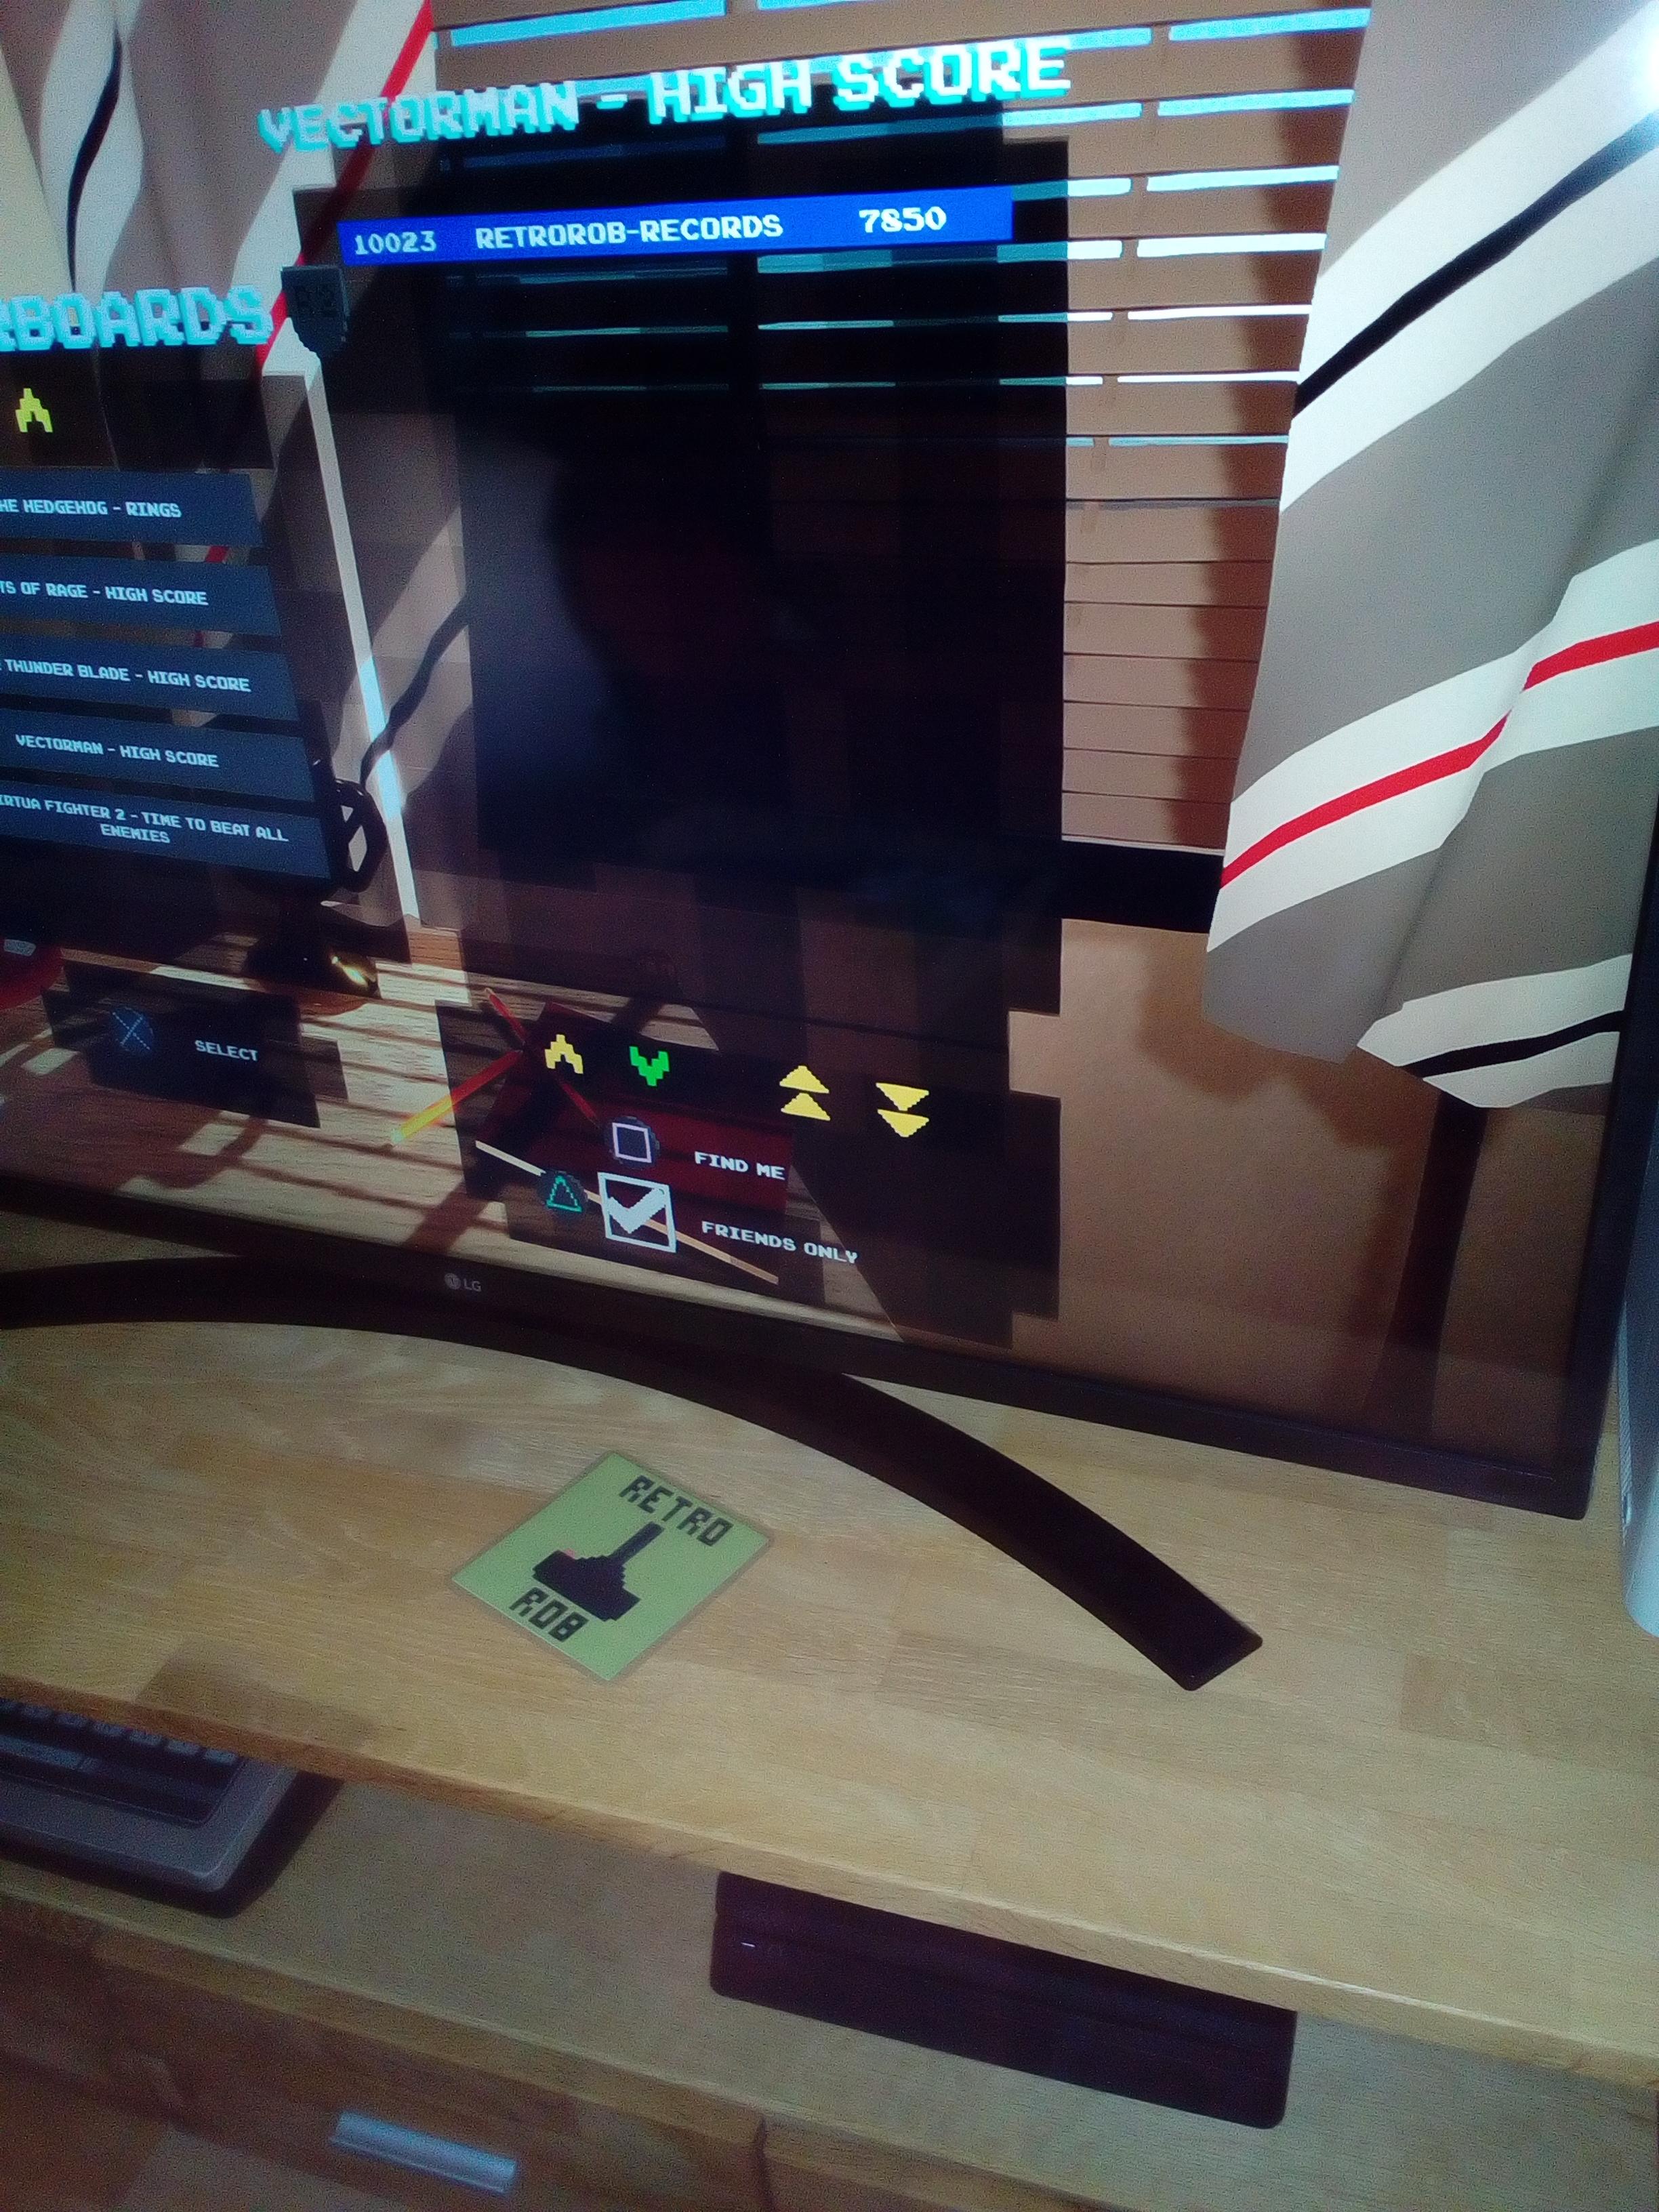 RetroRob: Sega Genesis Classics: Vectorman (Playstation 4) 7,850 points on 2020-12-31 03:40:05